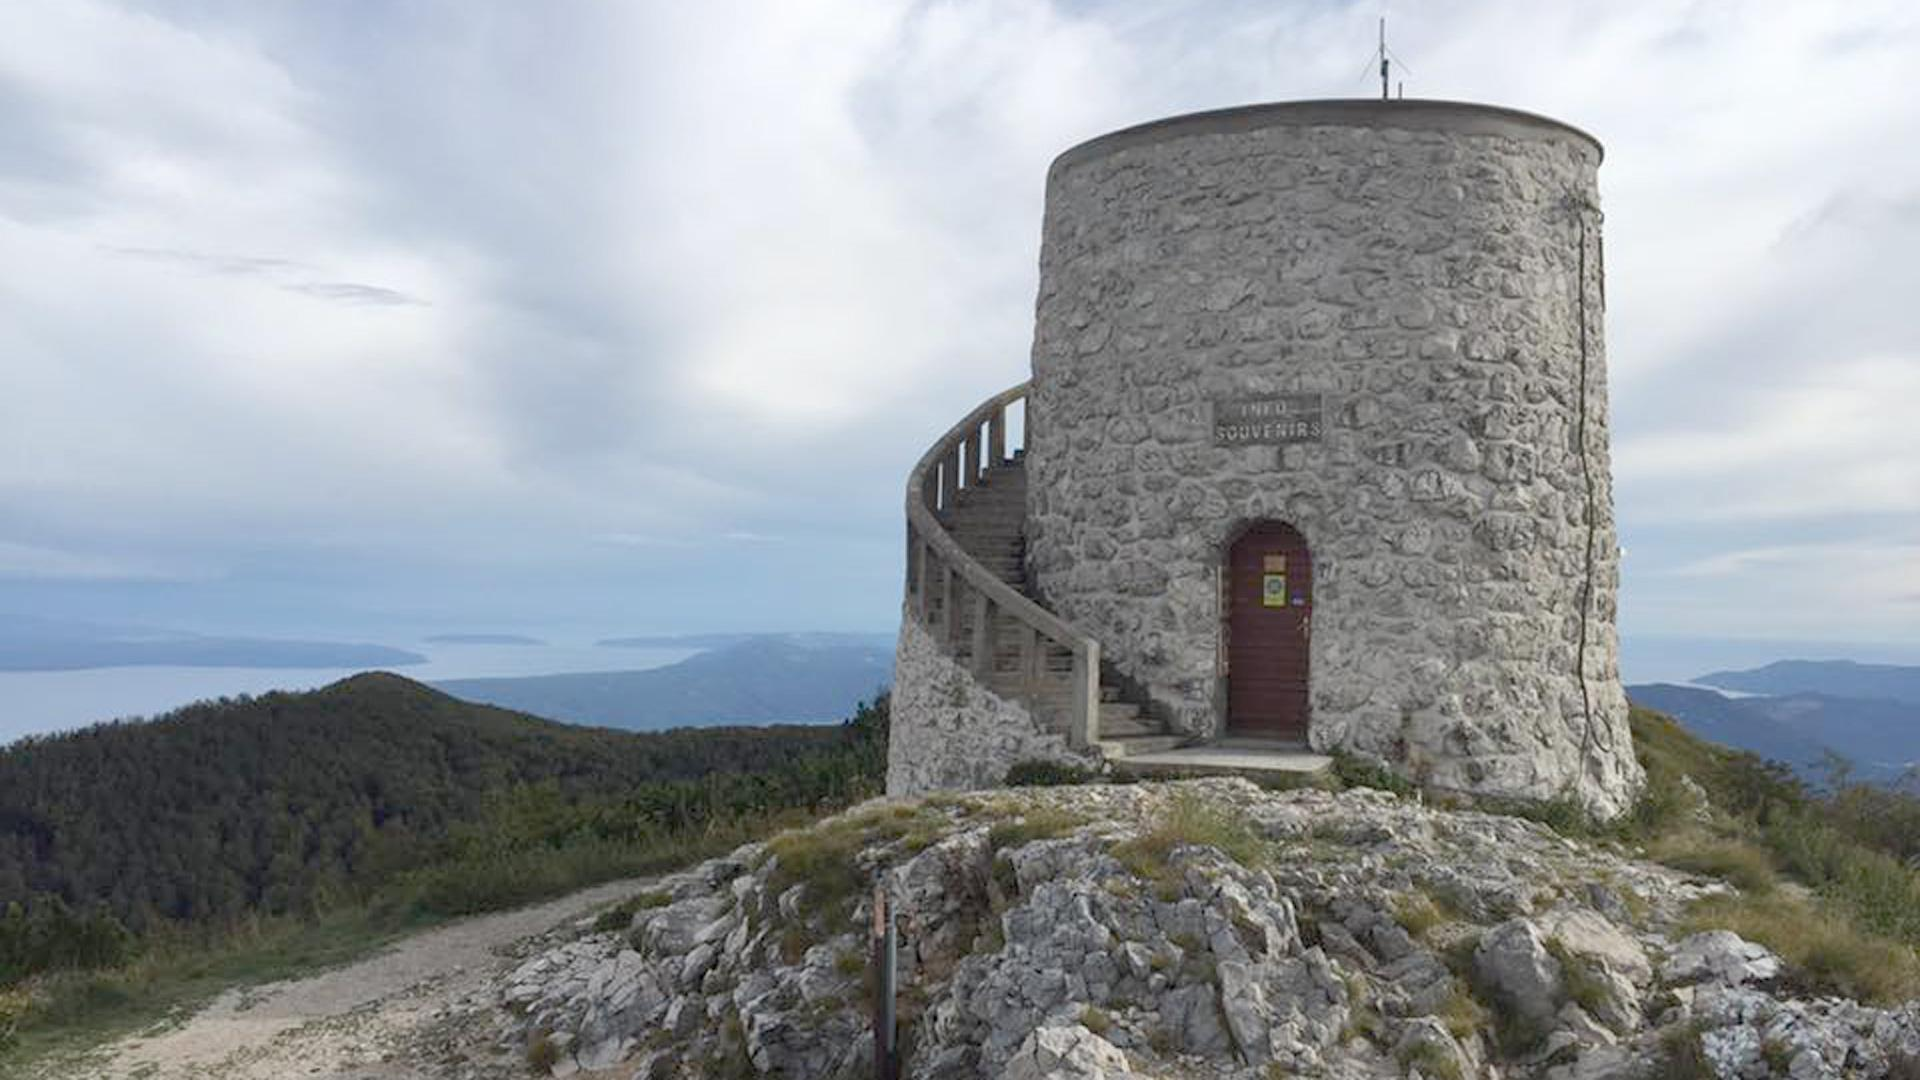 Biking Dubrovnik countryside and islands